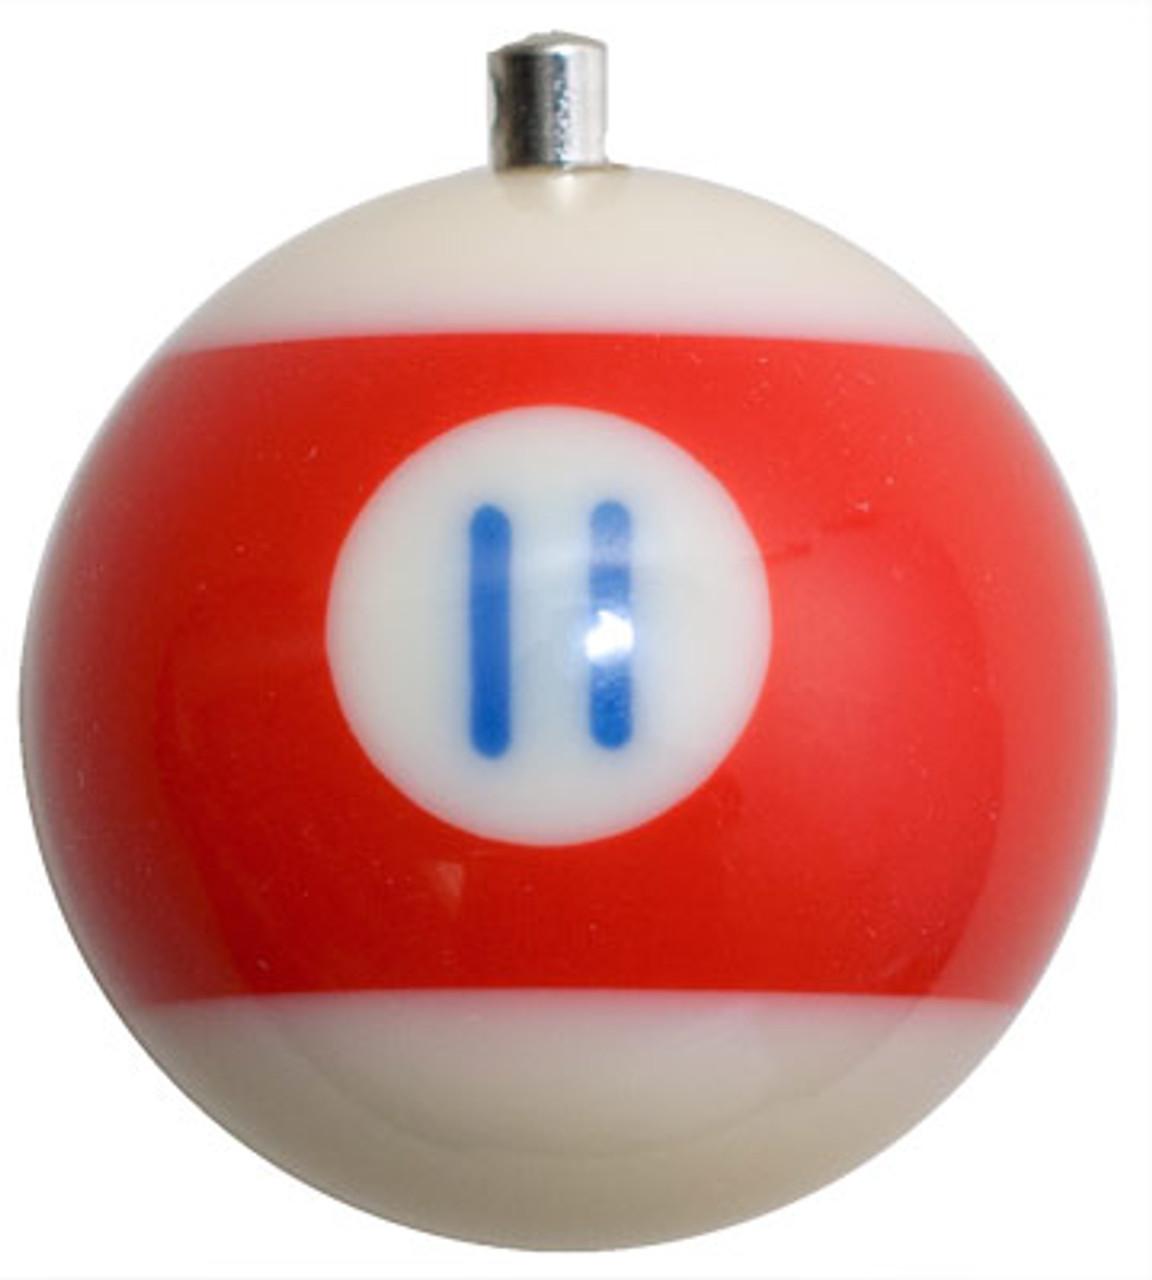 Billiard Ball Christmas Tree Ornaments - #11